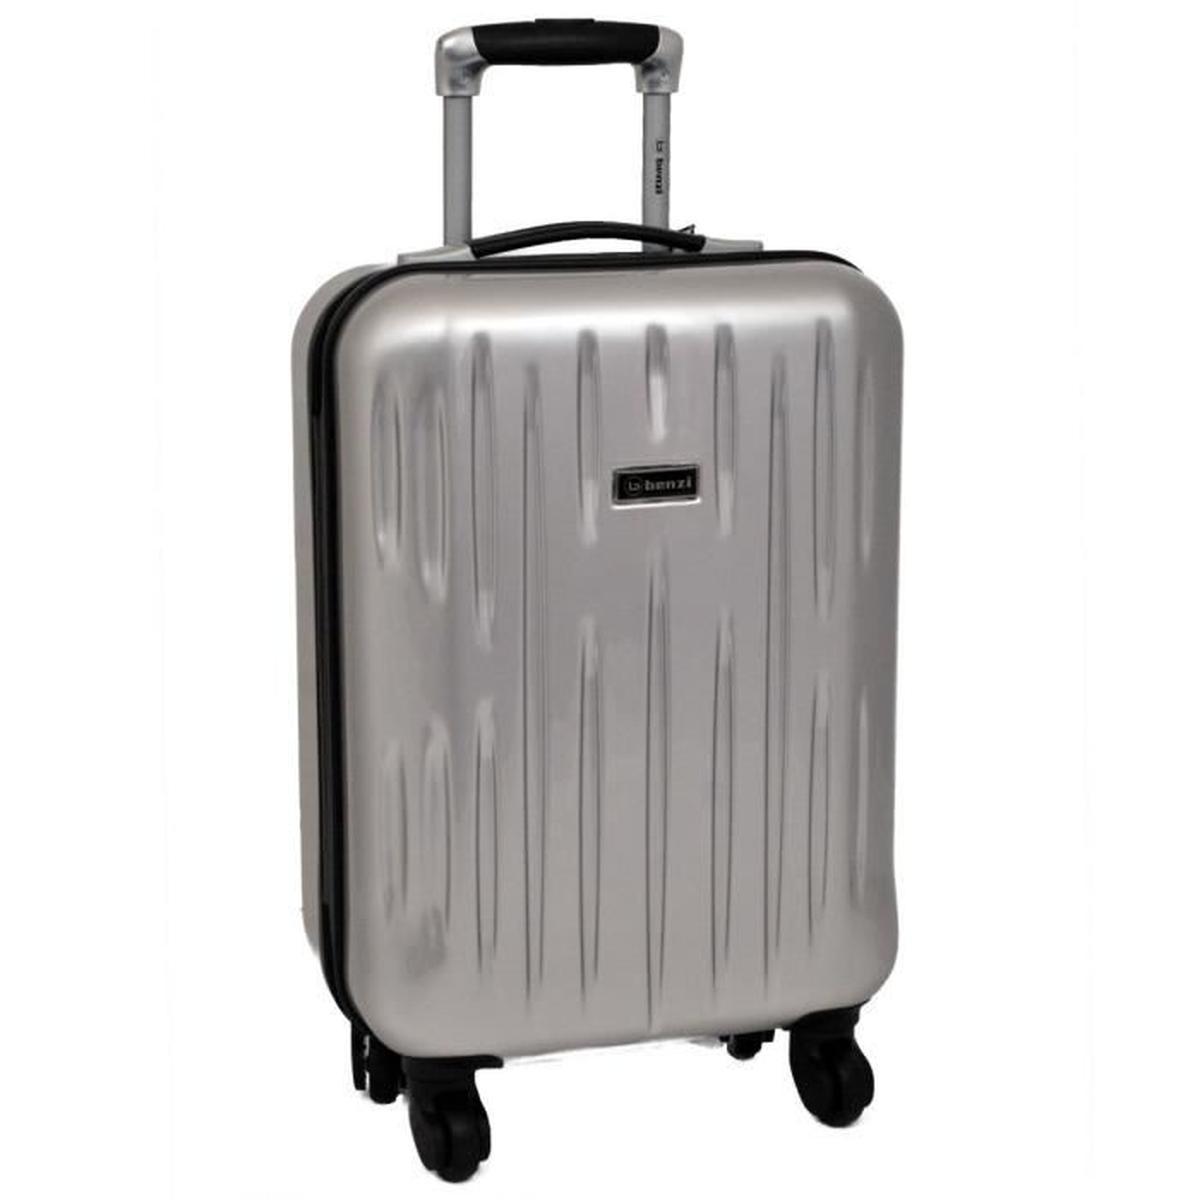 valise rigide a roulette